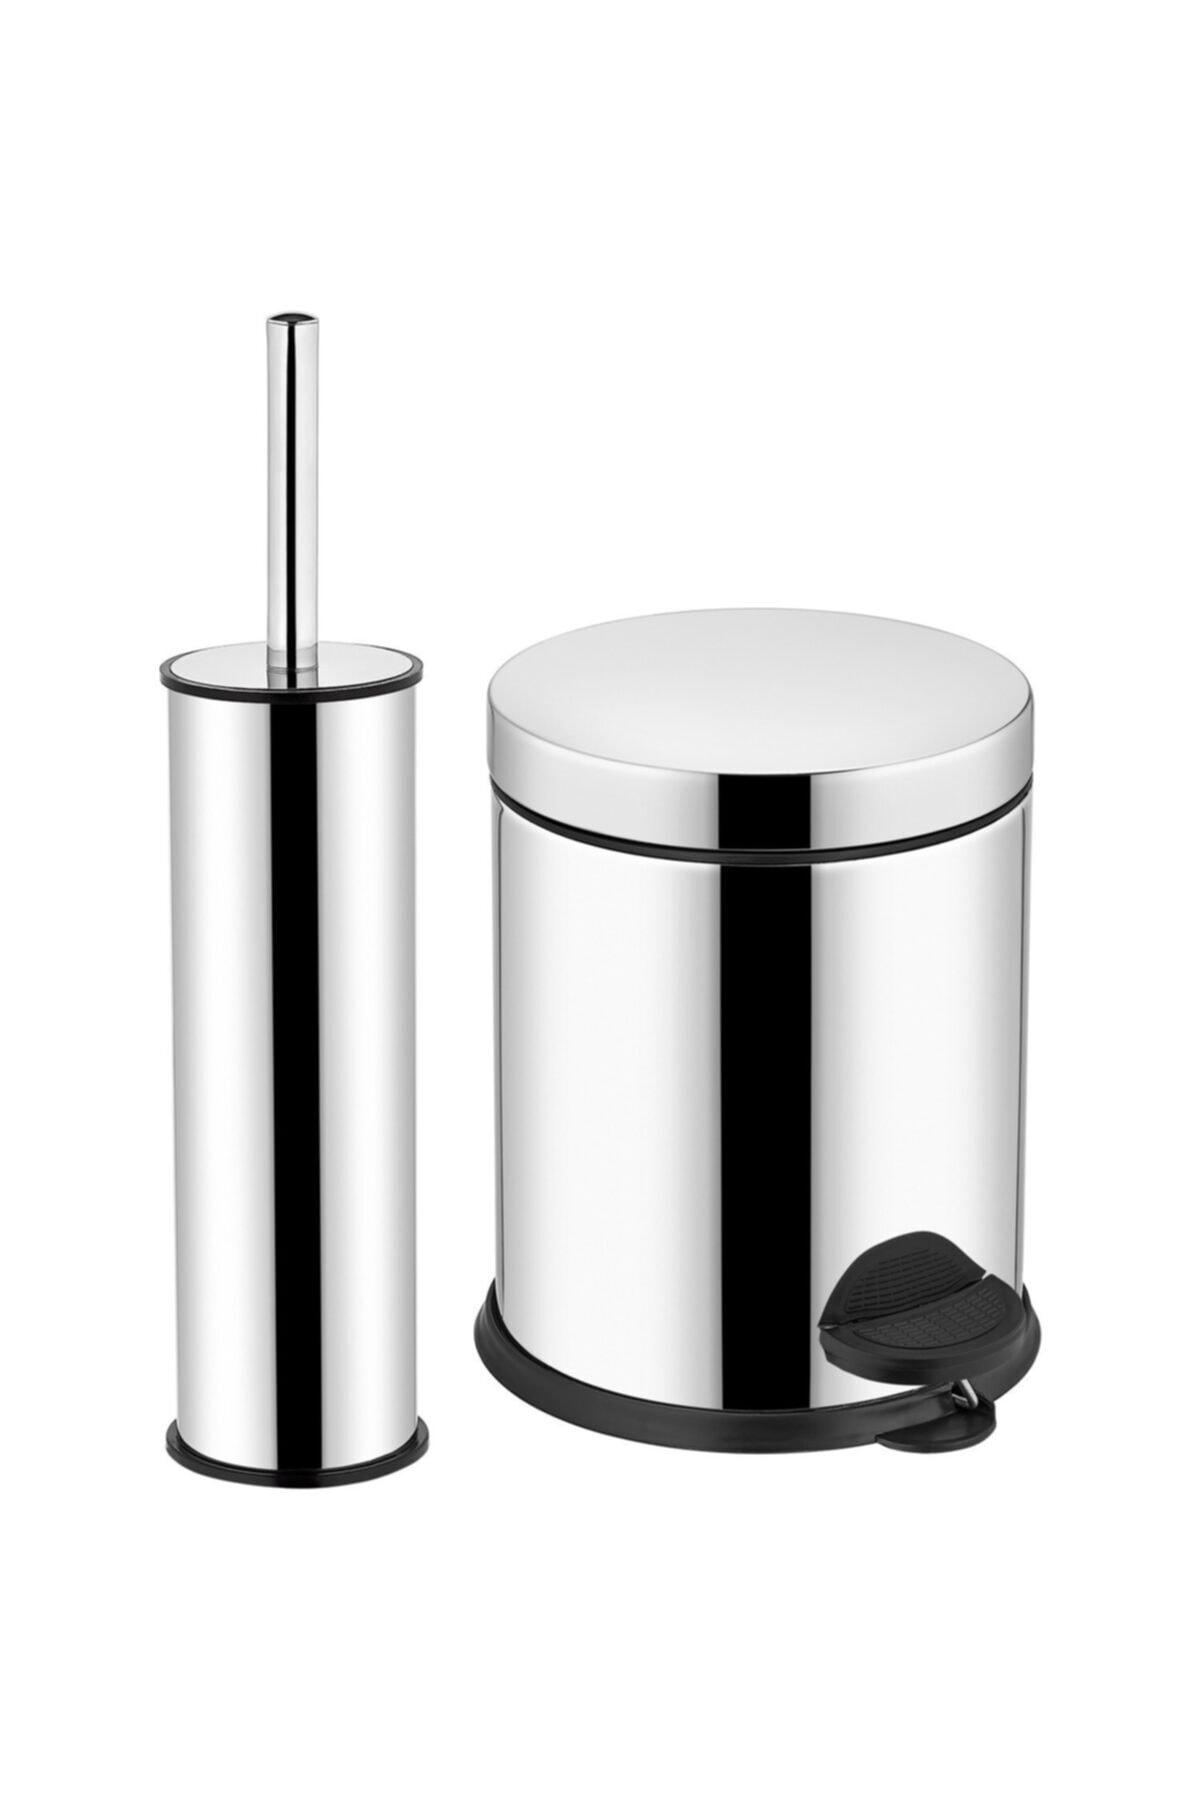 Pedallı Çöp Kovası Wc Klozet Tuvalet Fırça Seti Banyo Çöp Kovası 3 Lt Krom 2'li Banyo Seti